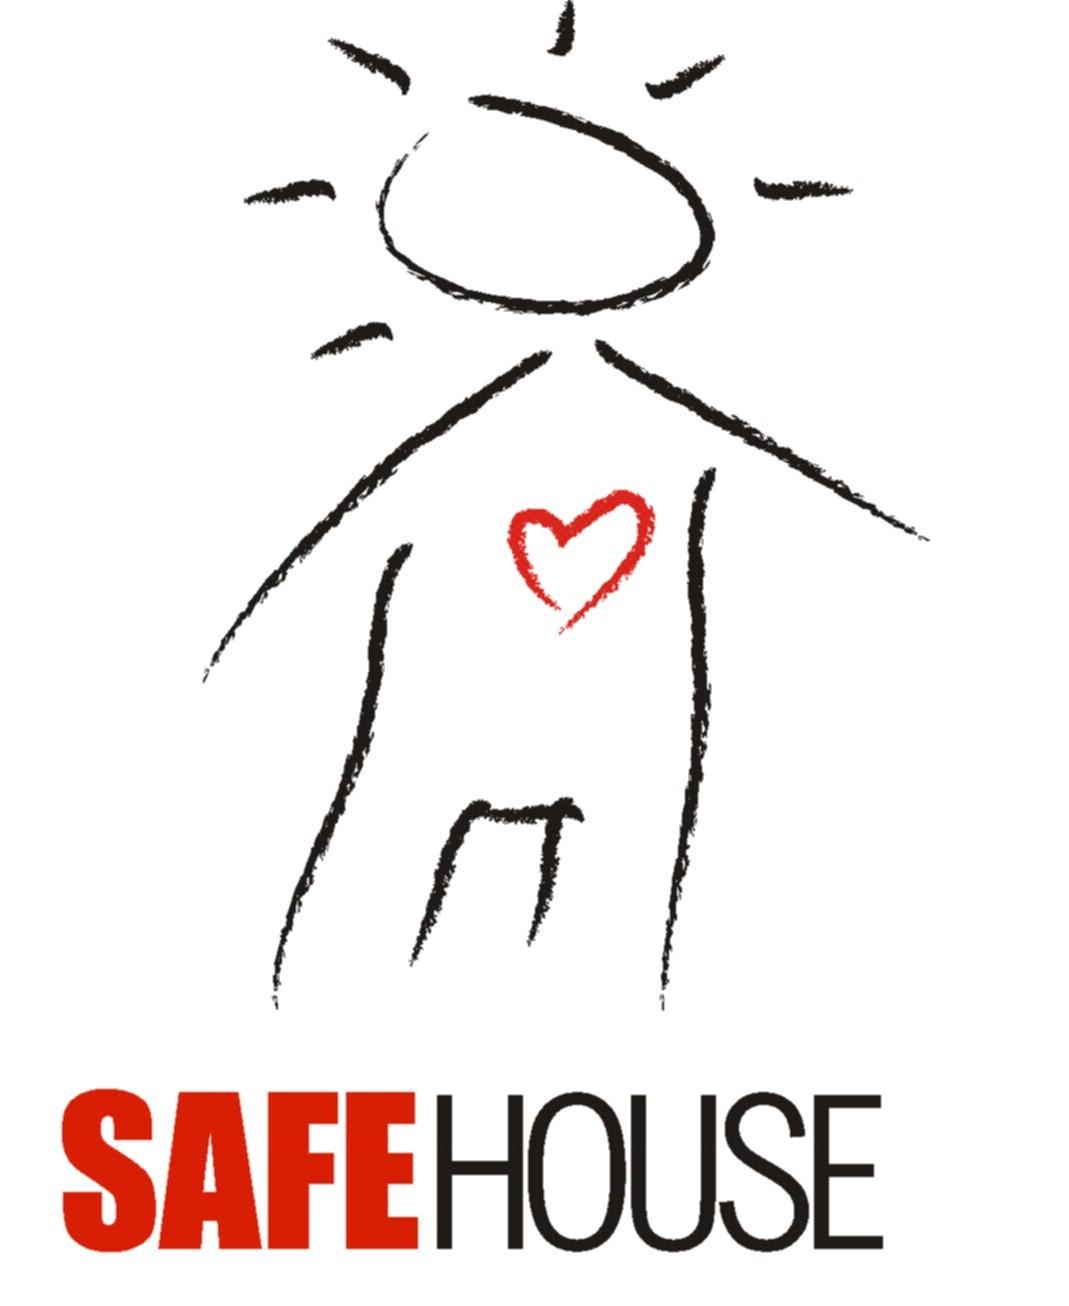 SafeHouse - PS 2015